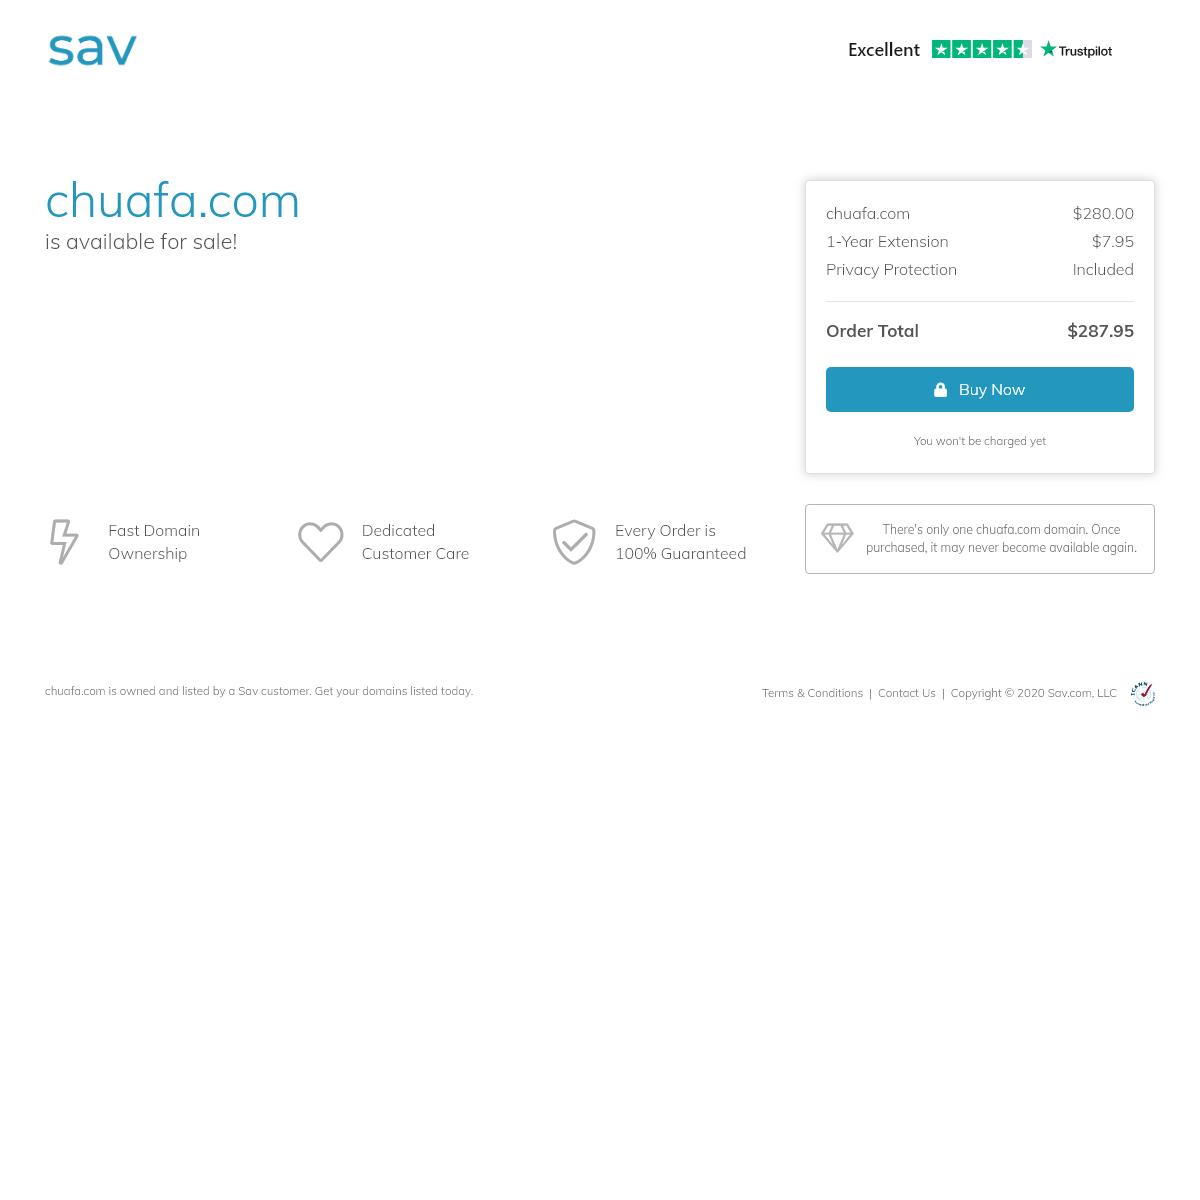 chuafa.com Is for Sale